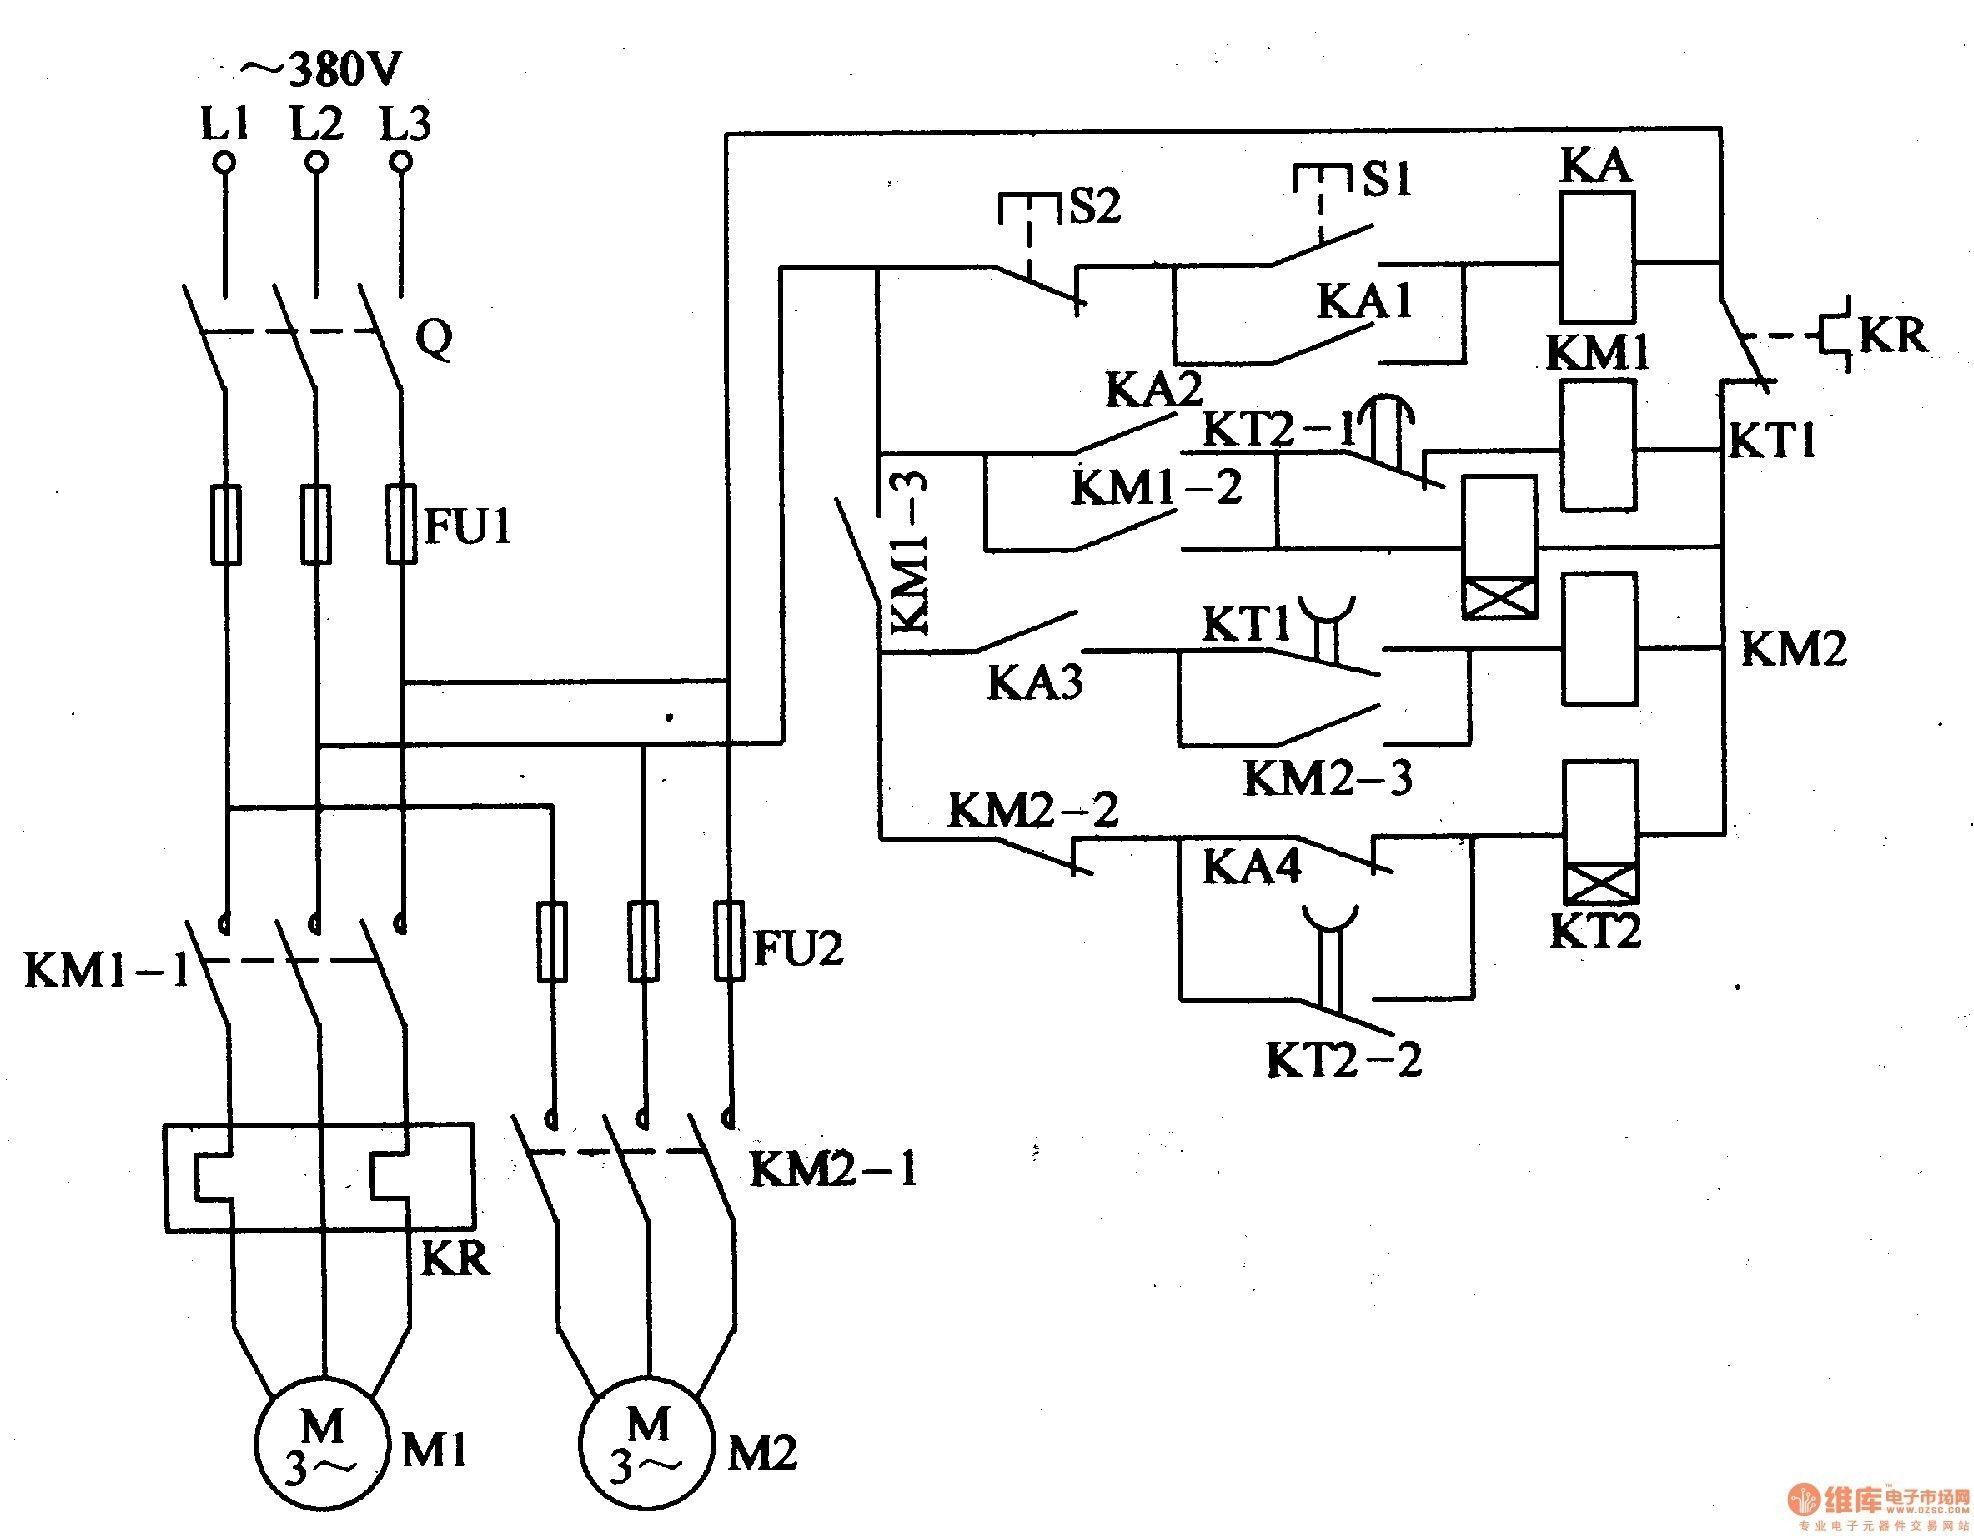 New Wiring Diagram For Auto Transformers Con Imagenes